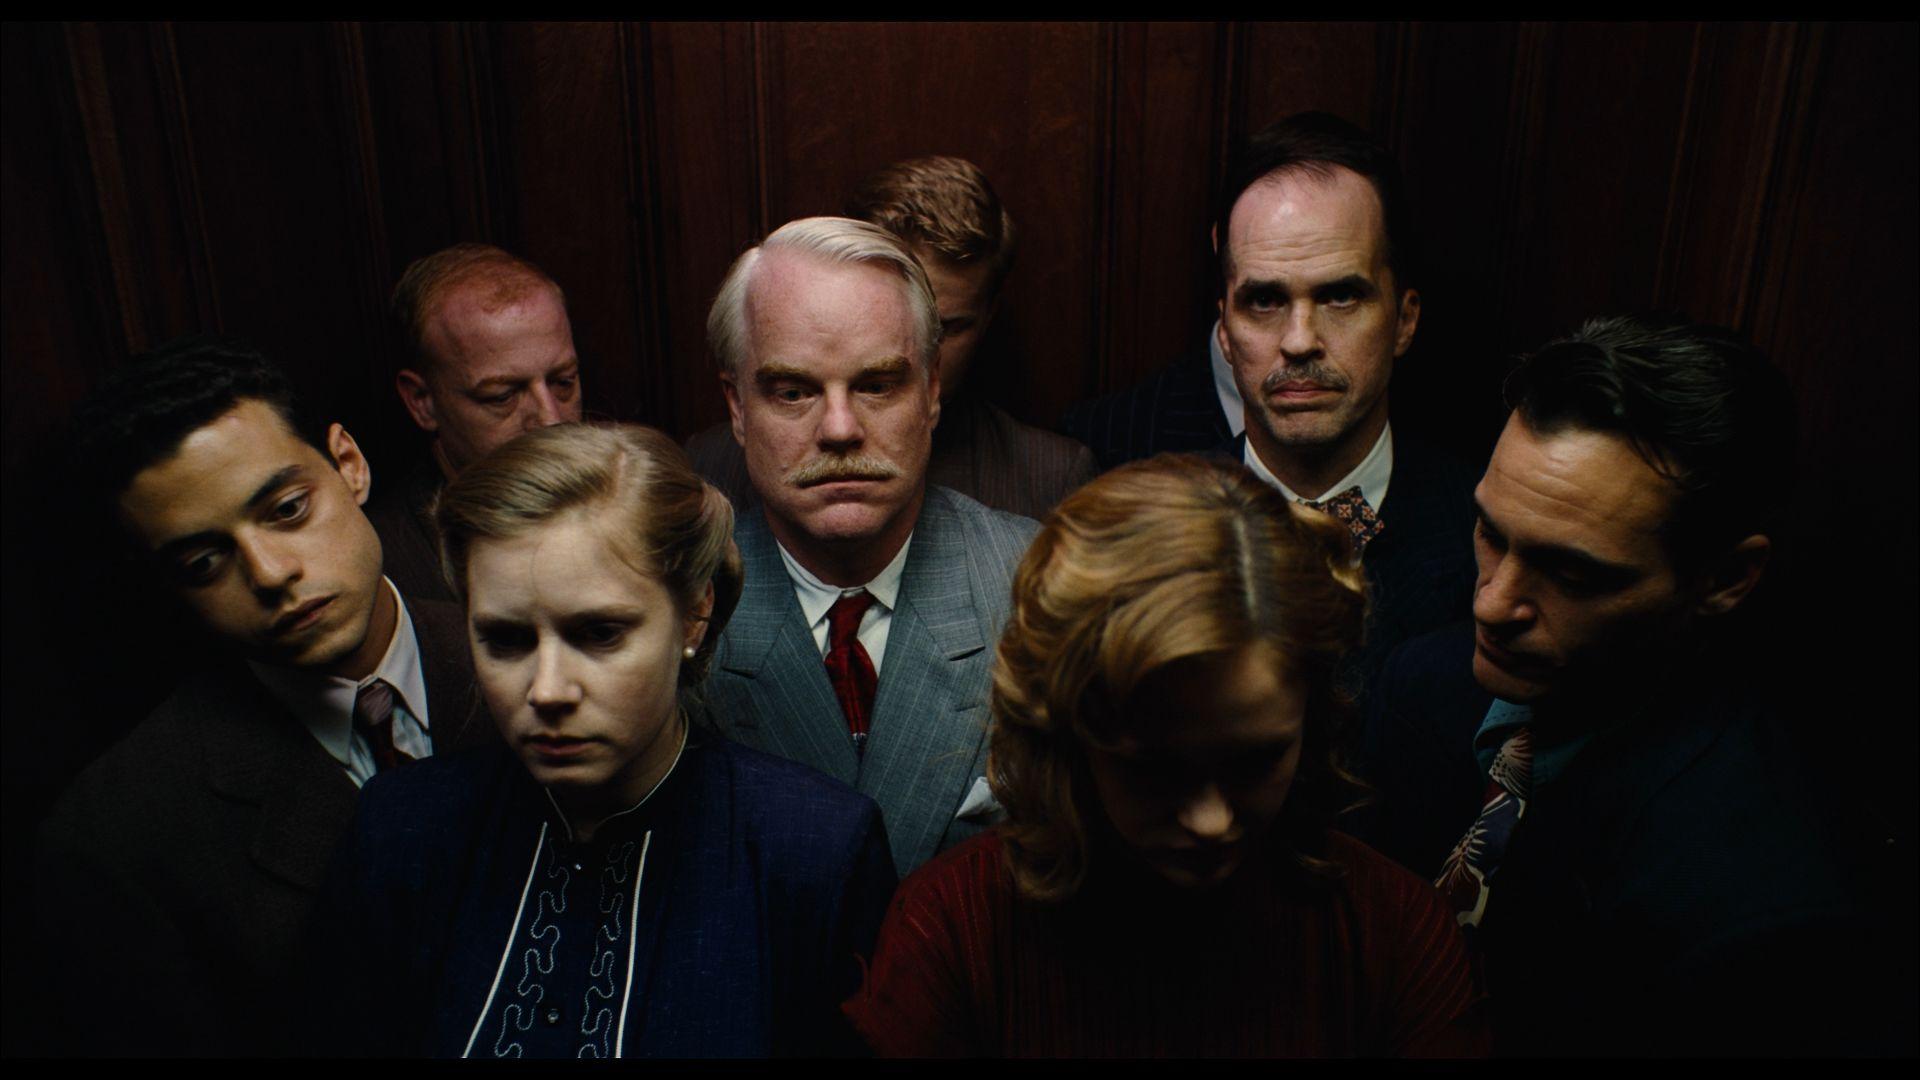 The Master (2012) Blu-ray Screenshot #1 / 50 | Great movies, Philip seymour hoffman, Great films